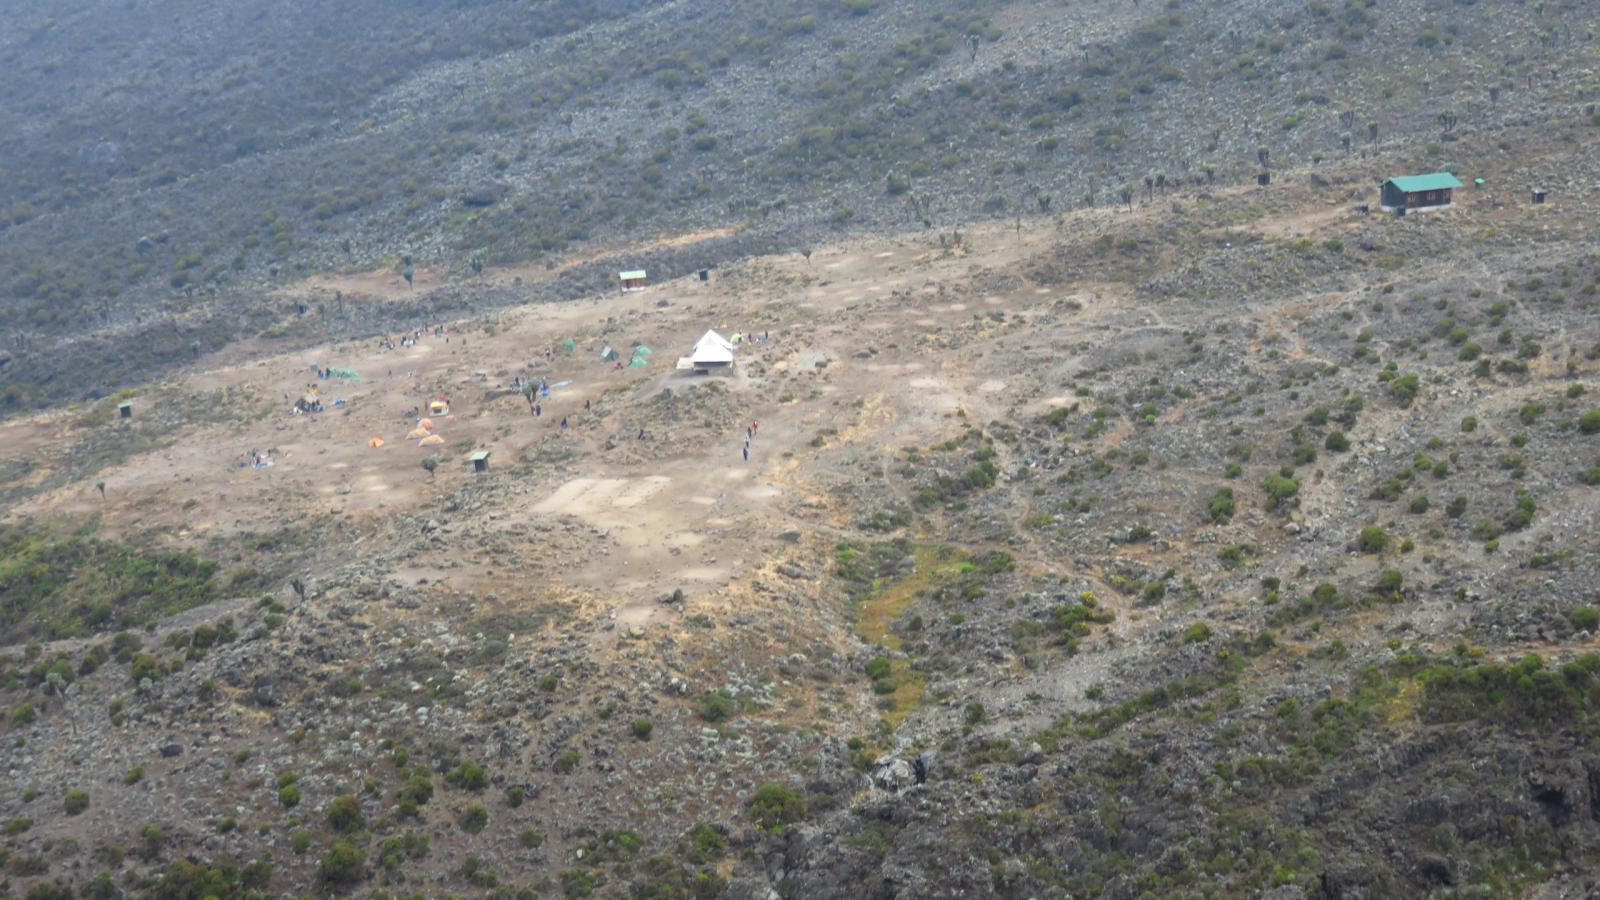 Barranco Camp m. 3950 (23-8-2014)